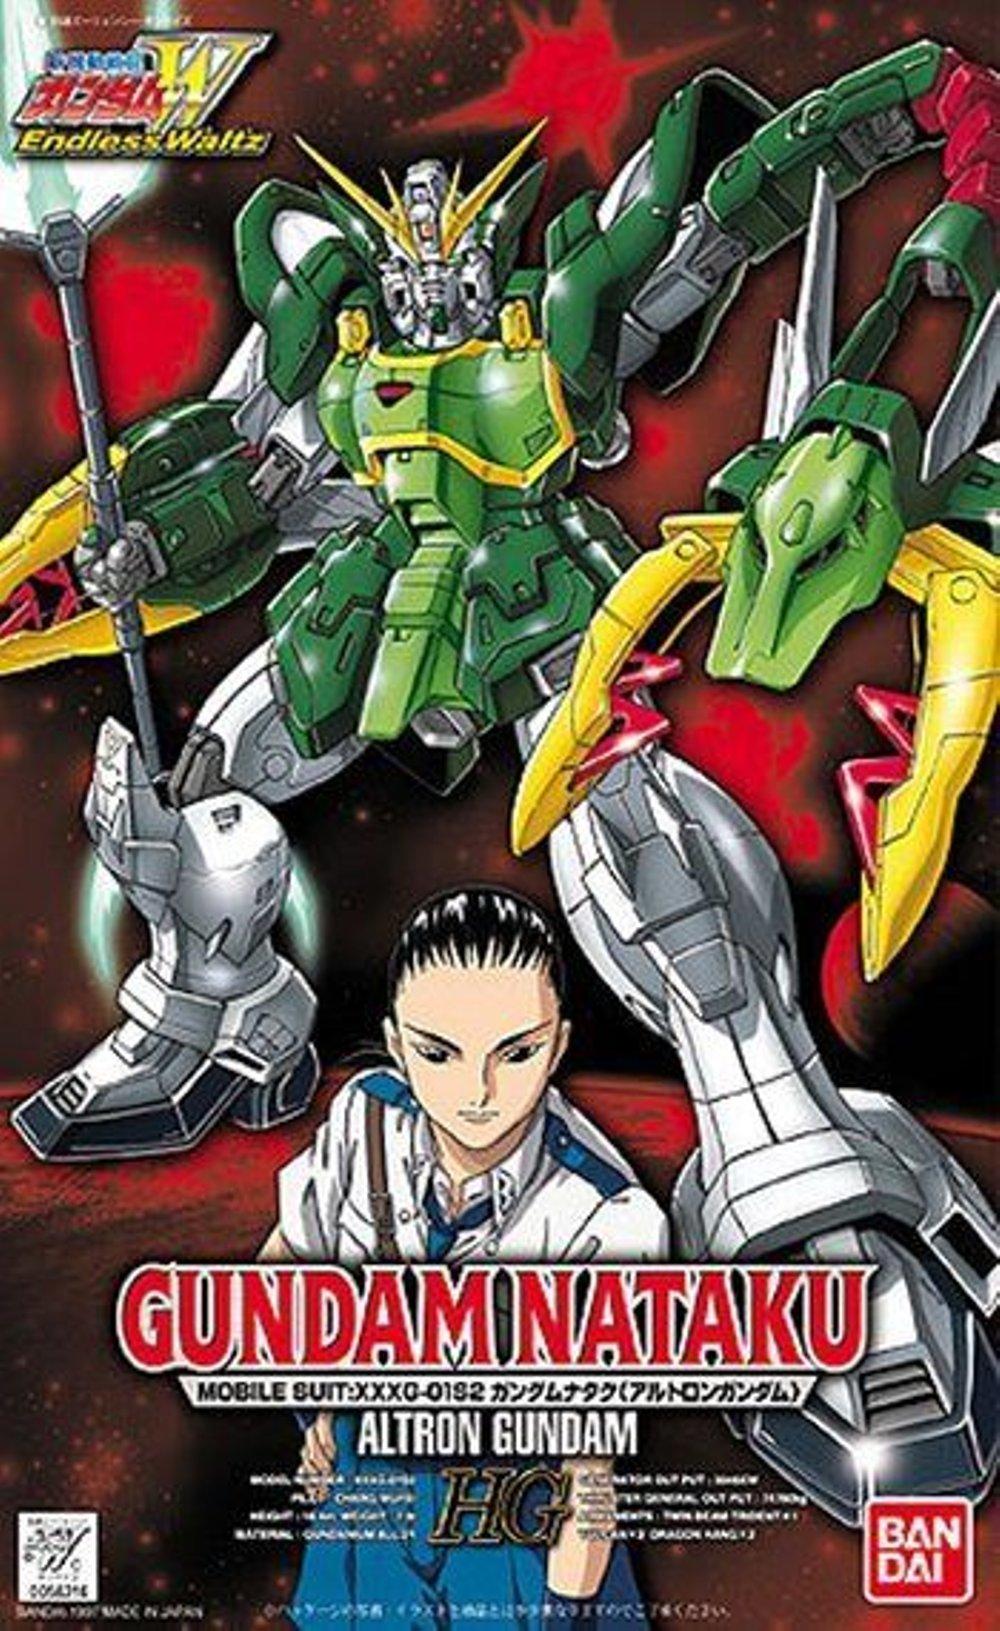 HG 1/100 EW-1 XXXG-01S2 ガンダムナタク [Gundam Nataku]